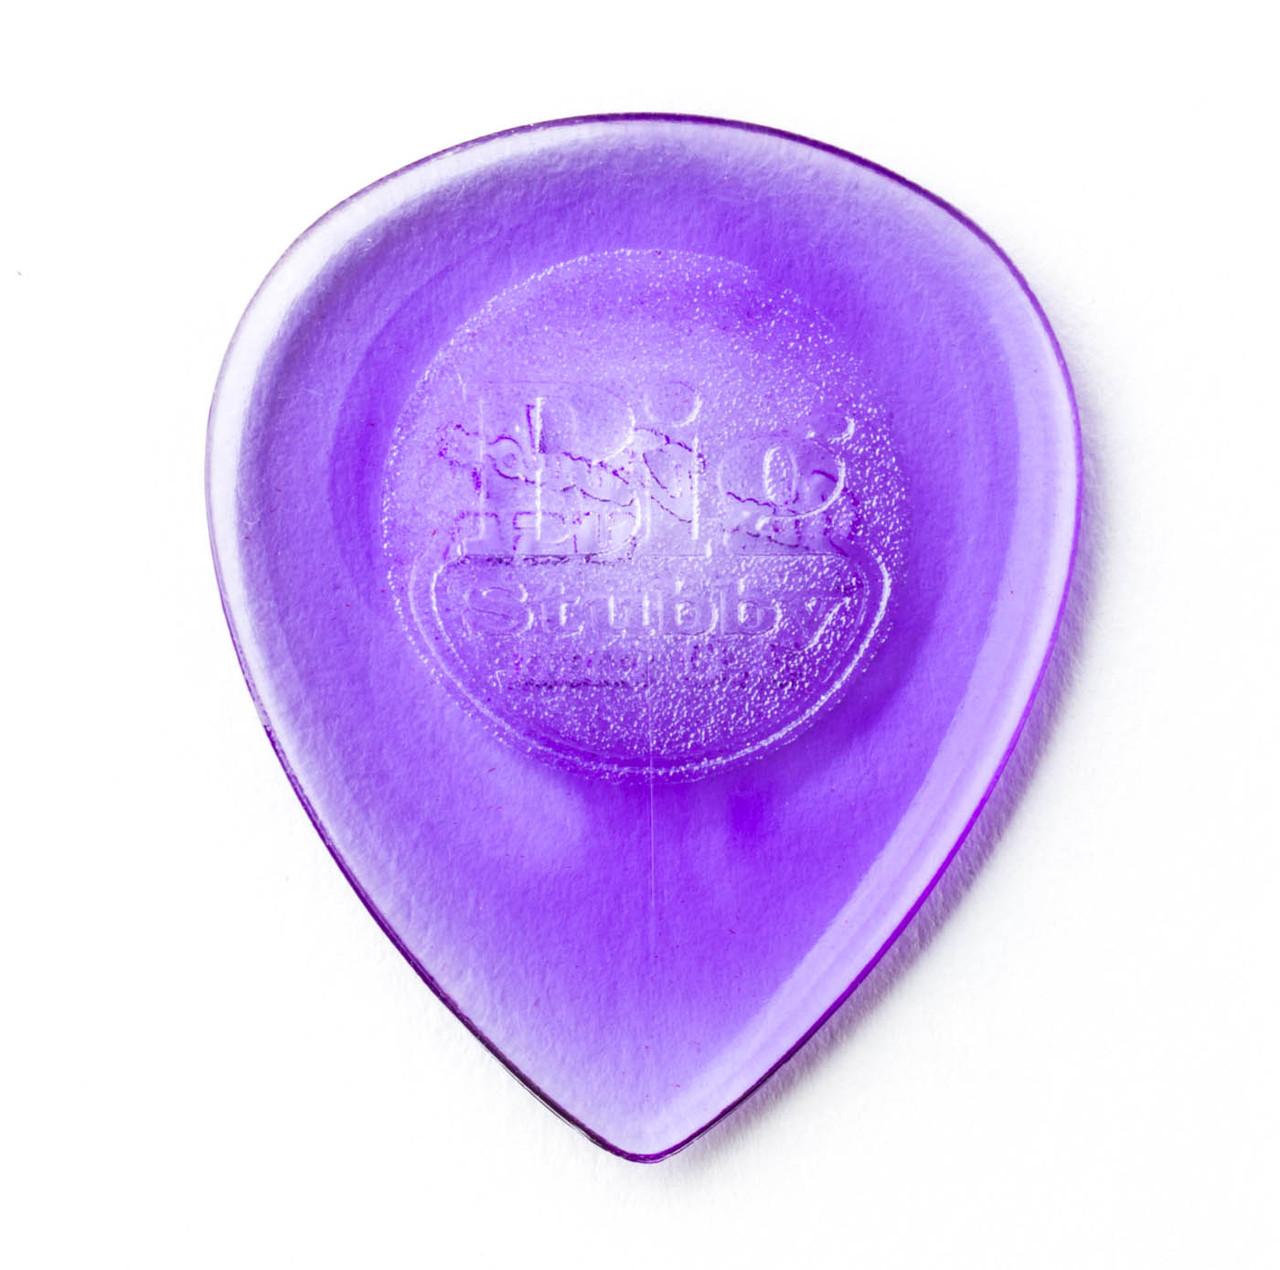 Dunlop Tri Stubby Picks 2.00 mm Player/'s Pack light purple 6 pcs.